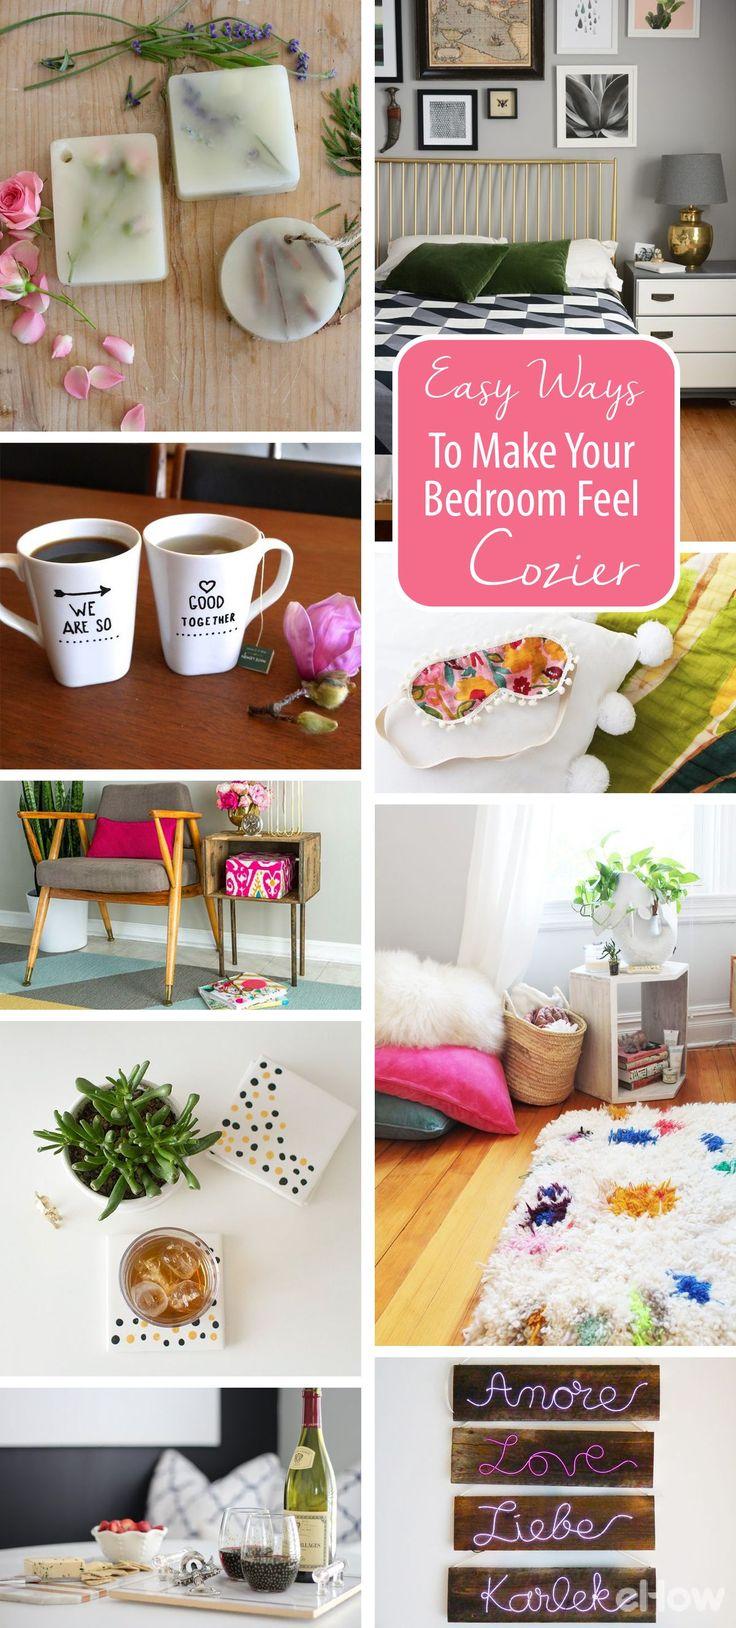 10 Easy Ways To Make Your Bedroom Feel Even Cozier